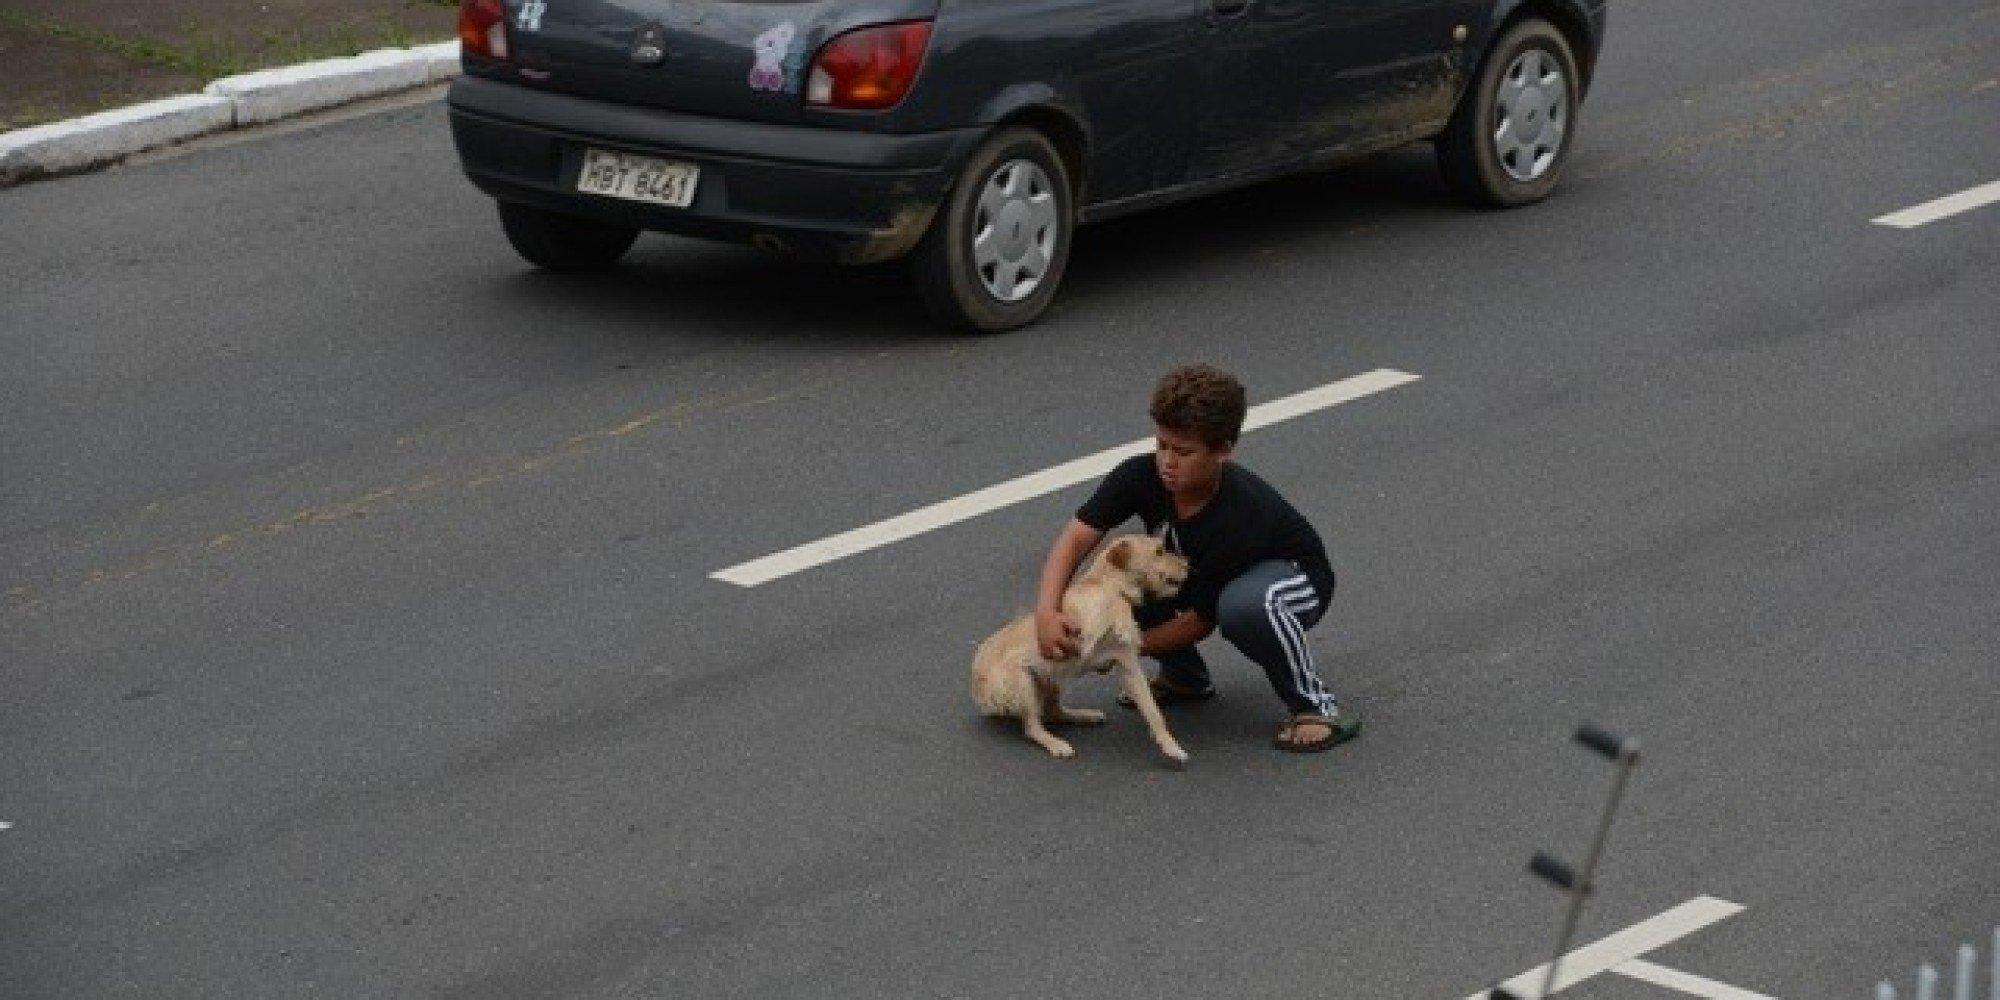 Девушка «намеренно» переехала намашине собаку наглазах у владельца